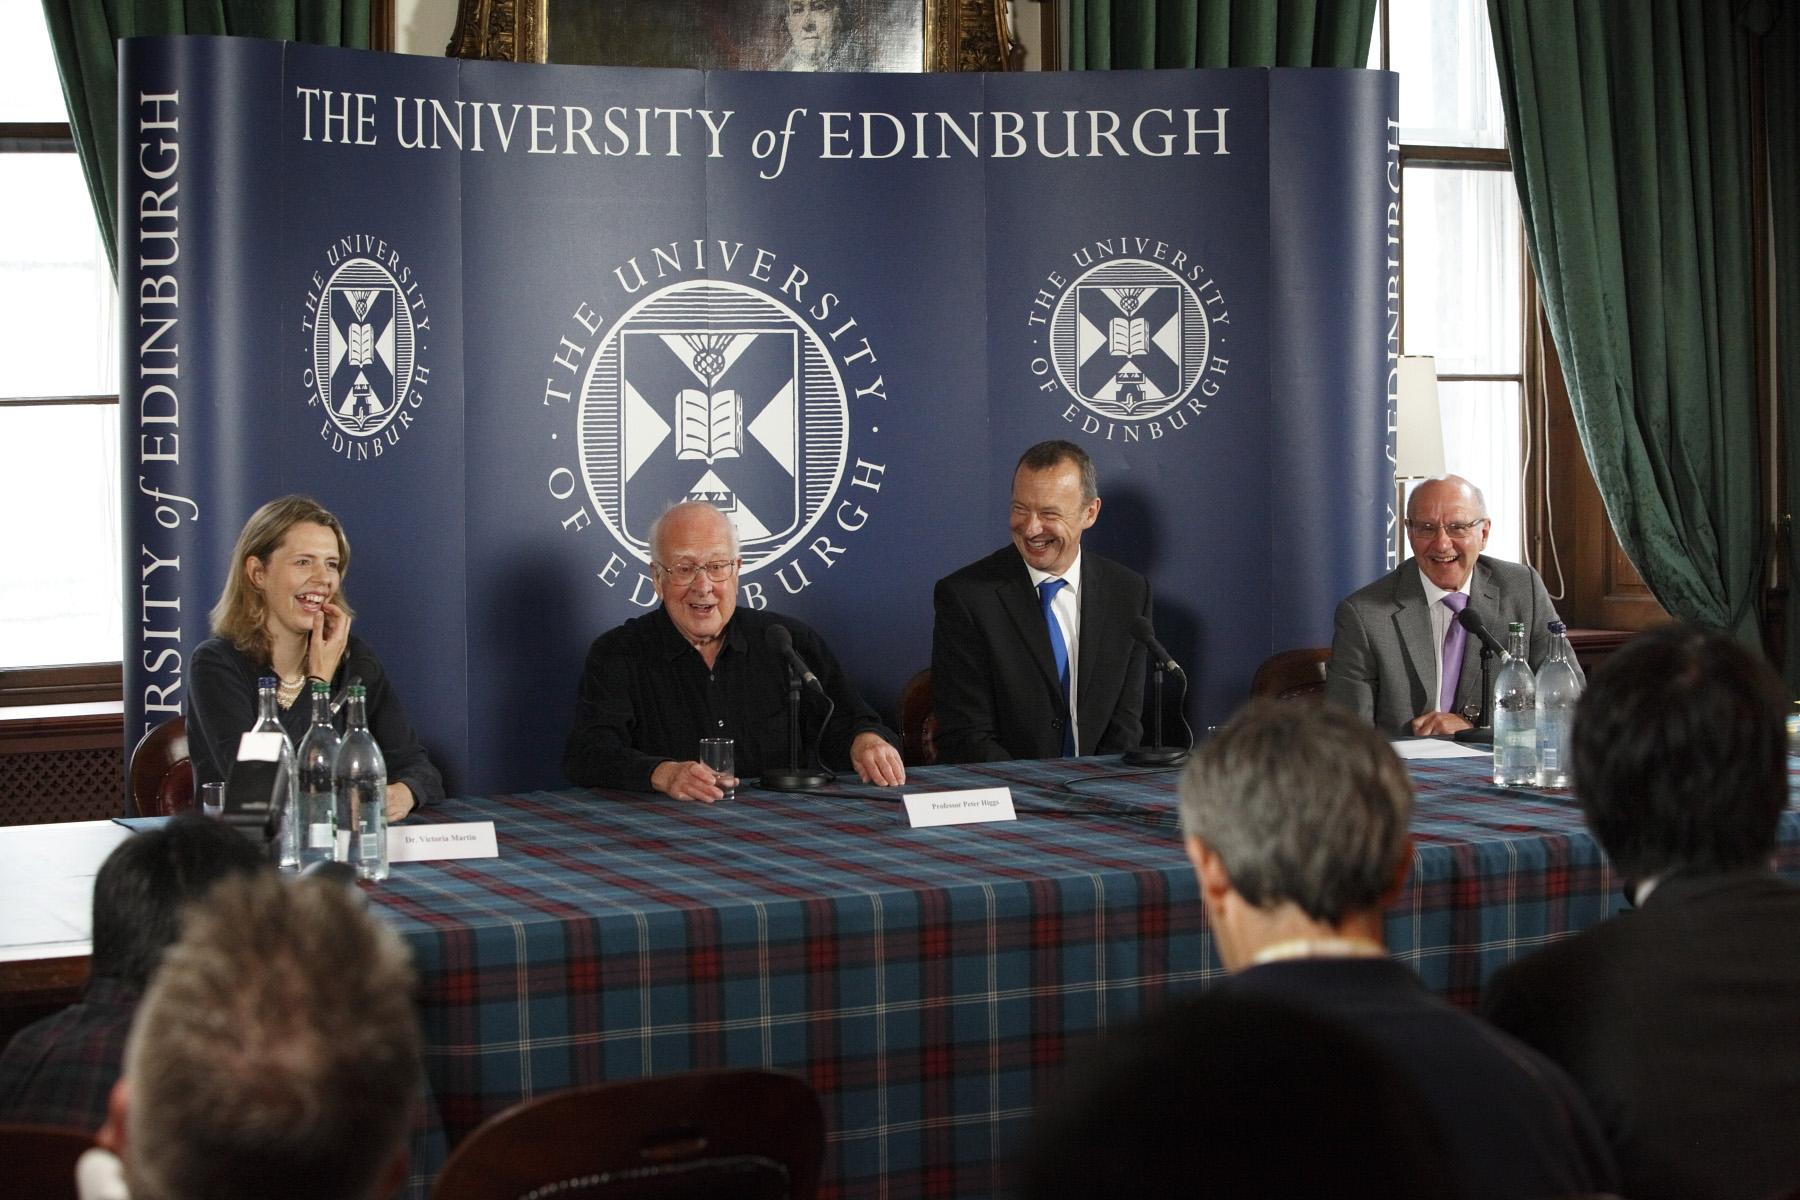 Victoria Martin, Peter Higgs, Richard Kenway and Alan Walker. Image copyright Graham Clark.